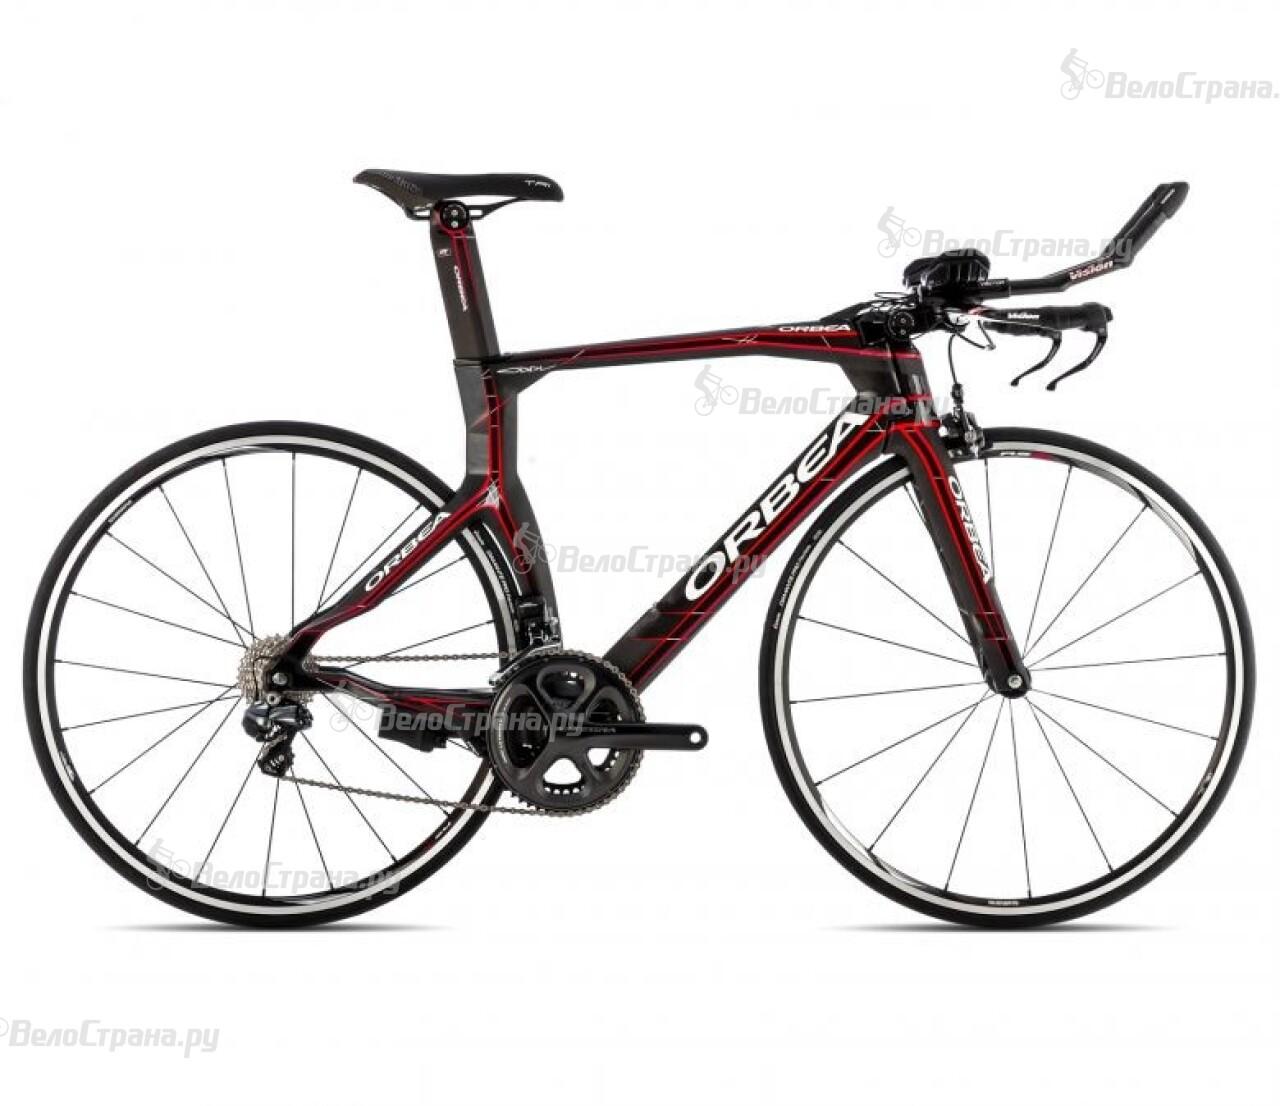 Велосипед Orbea Ordu M10 XS (2014) велосипед orbea ordu m ltd 2014